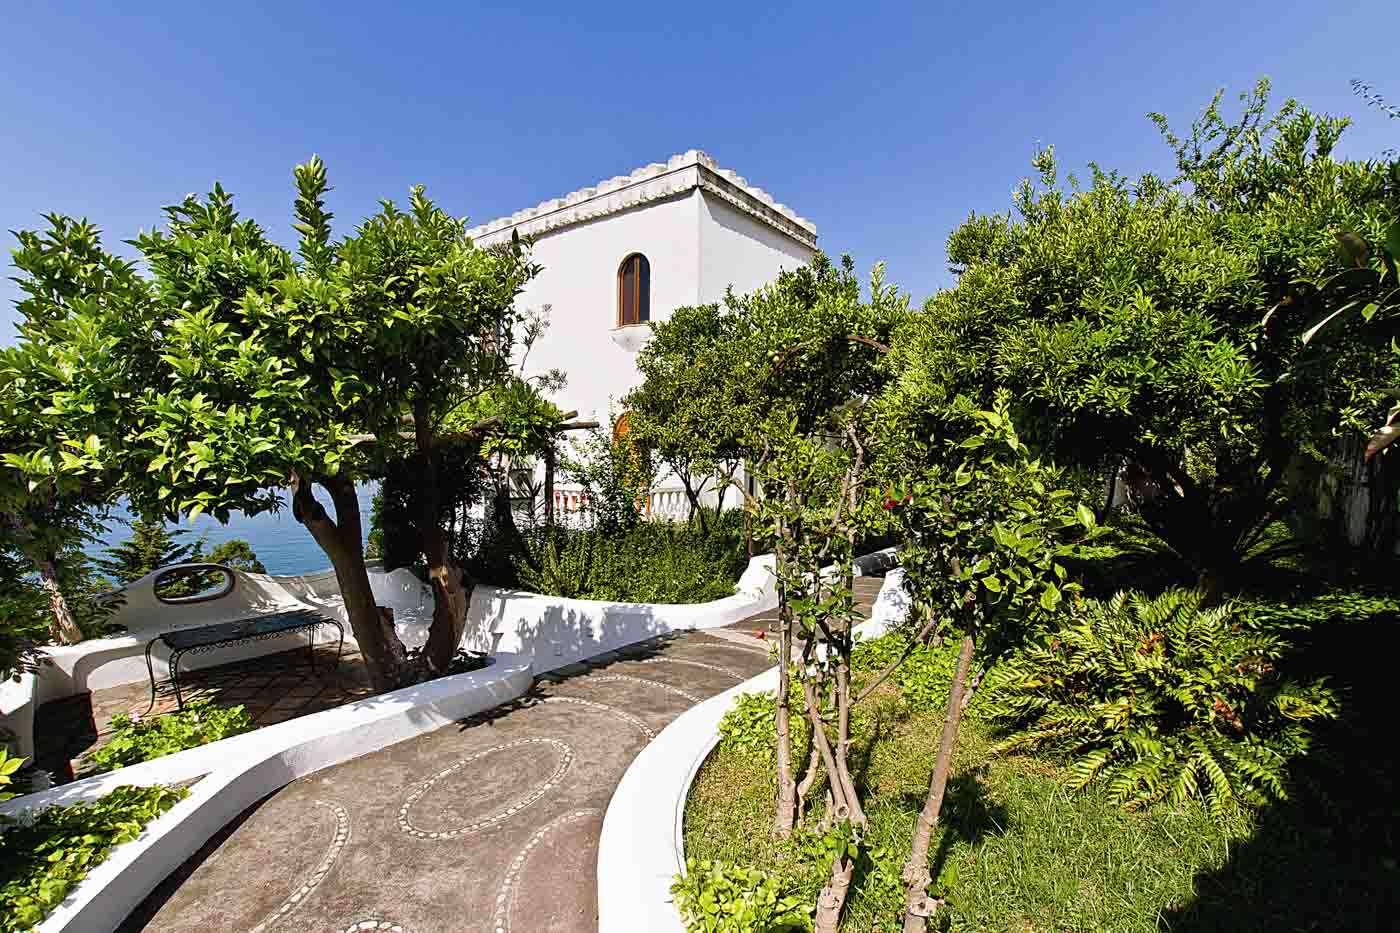 Luxury vacation rentals europe - Italy - Am alfico ast - Prai ano - Diana Villa - Image 1/15